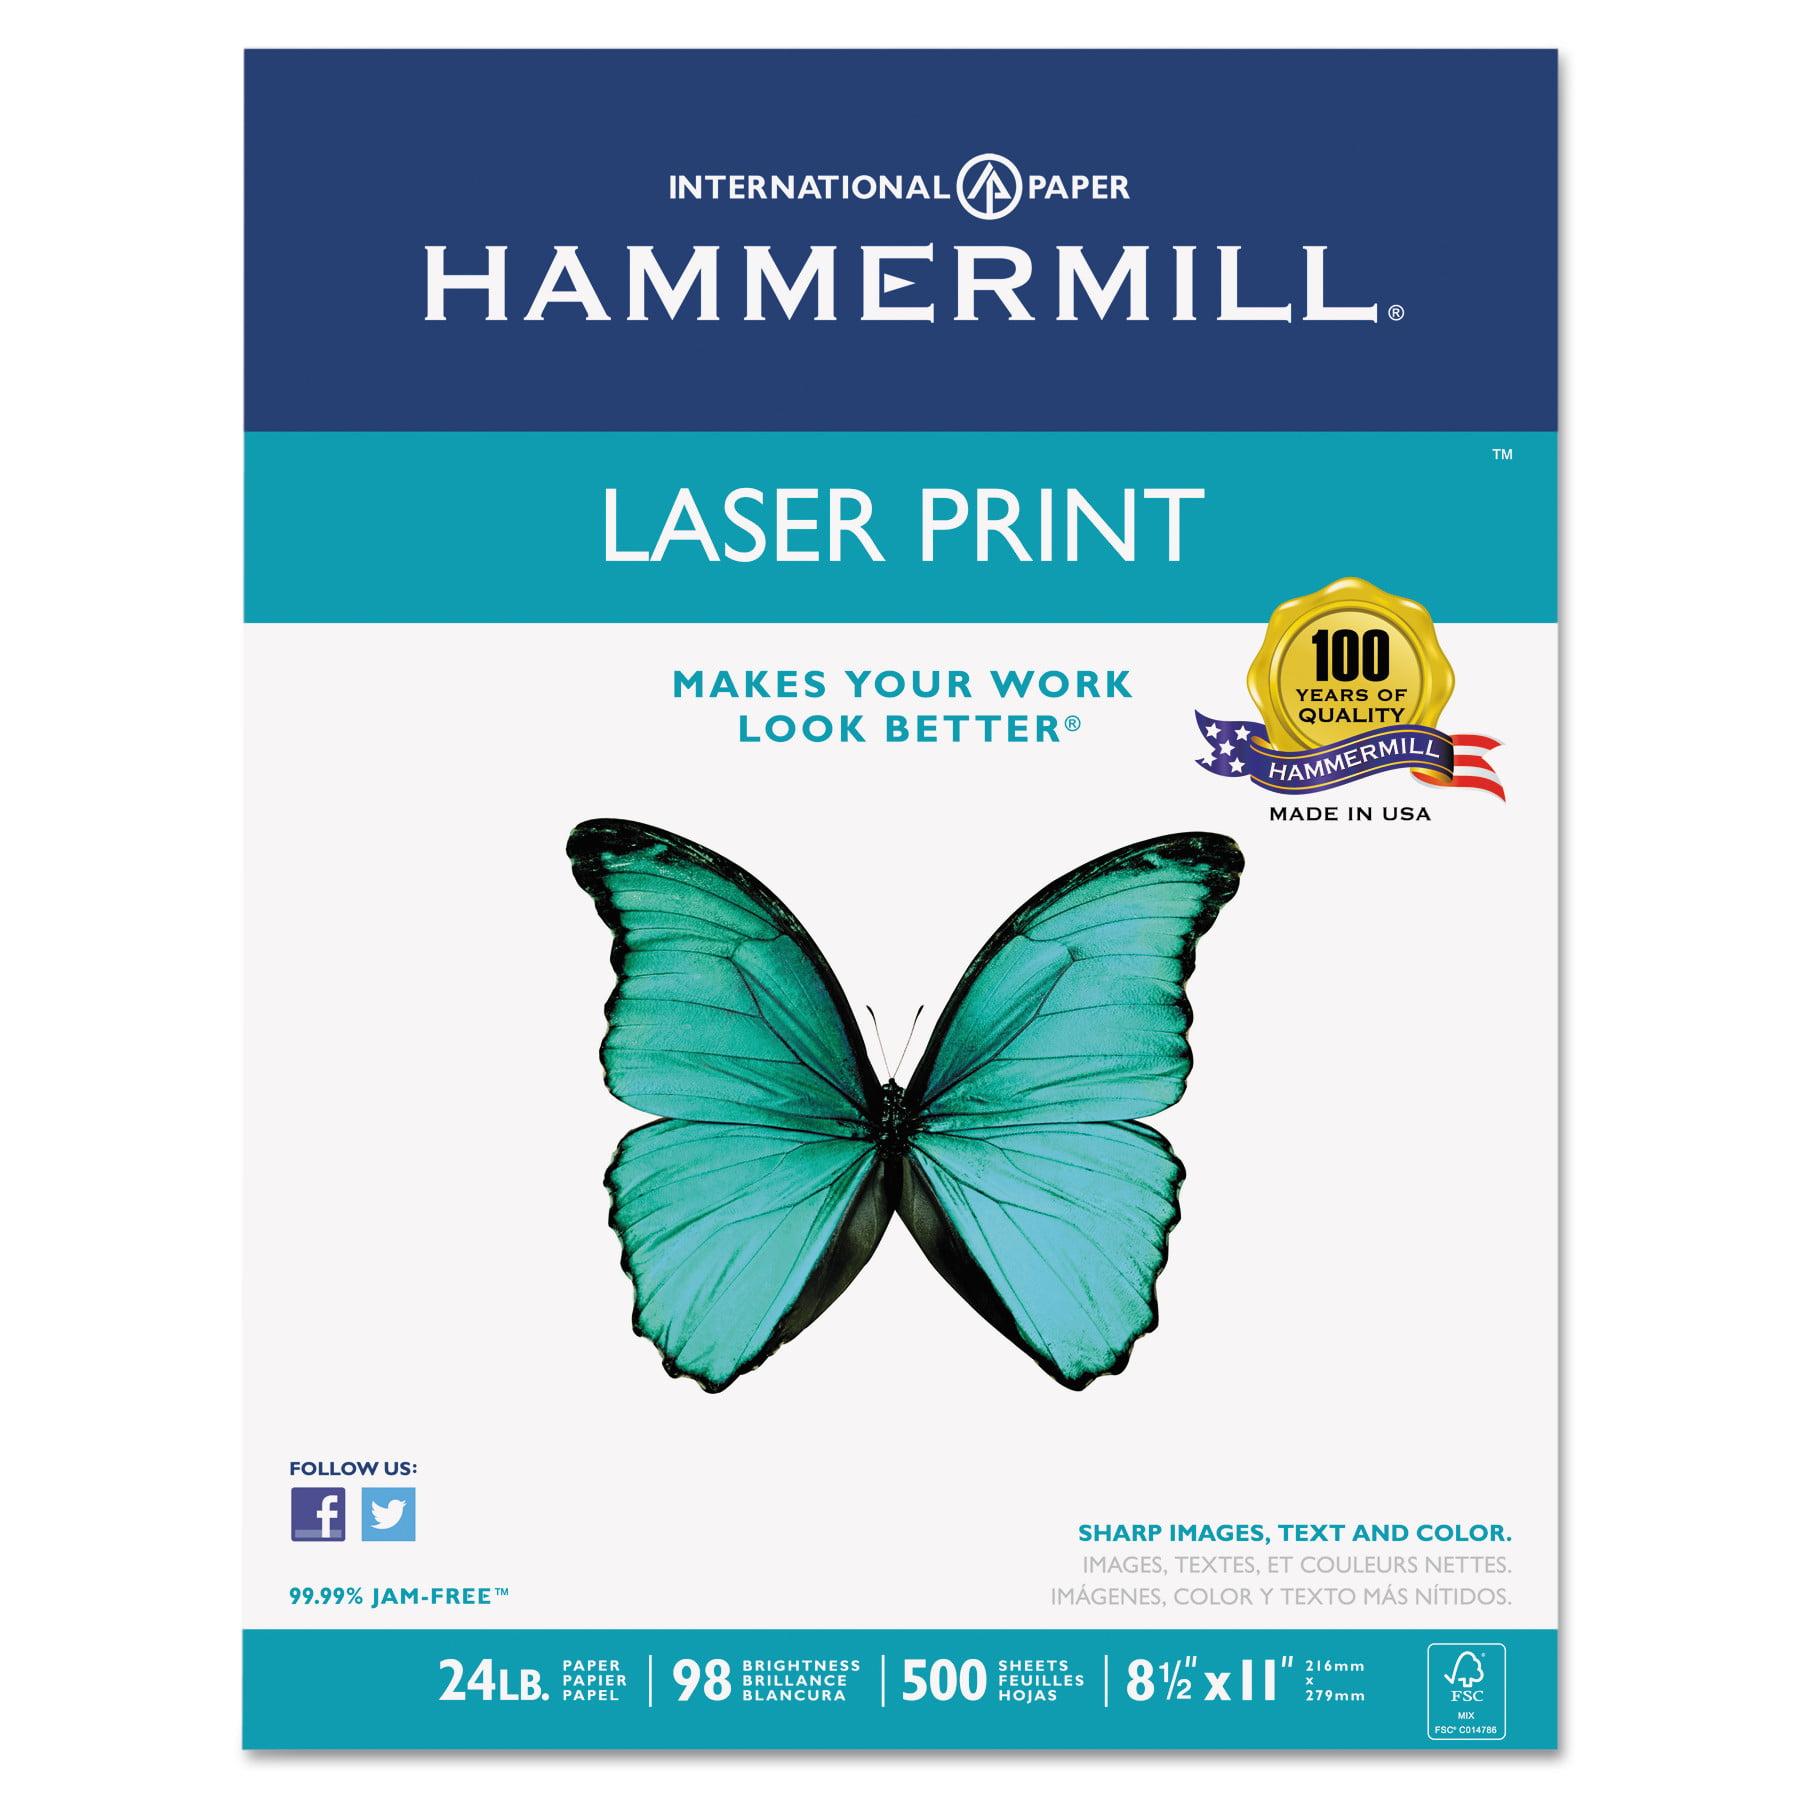 Hammermill Laser Print Office Paper, 98 Brightness, 24lb, 8-1/2 x 11, White, 500 Sheets/Rm